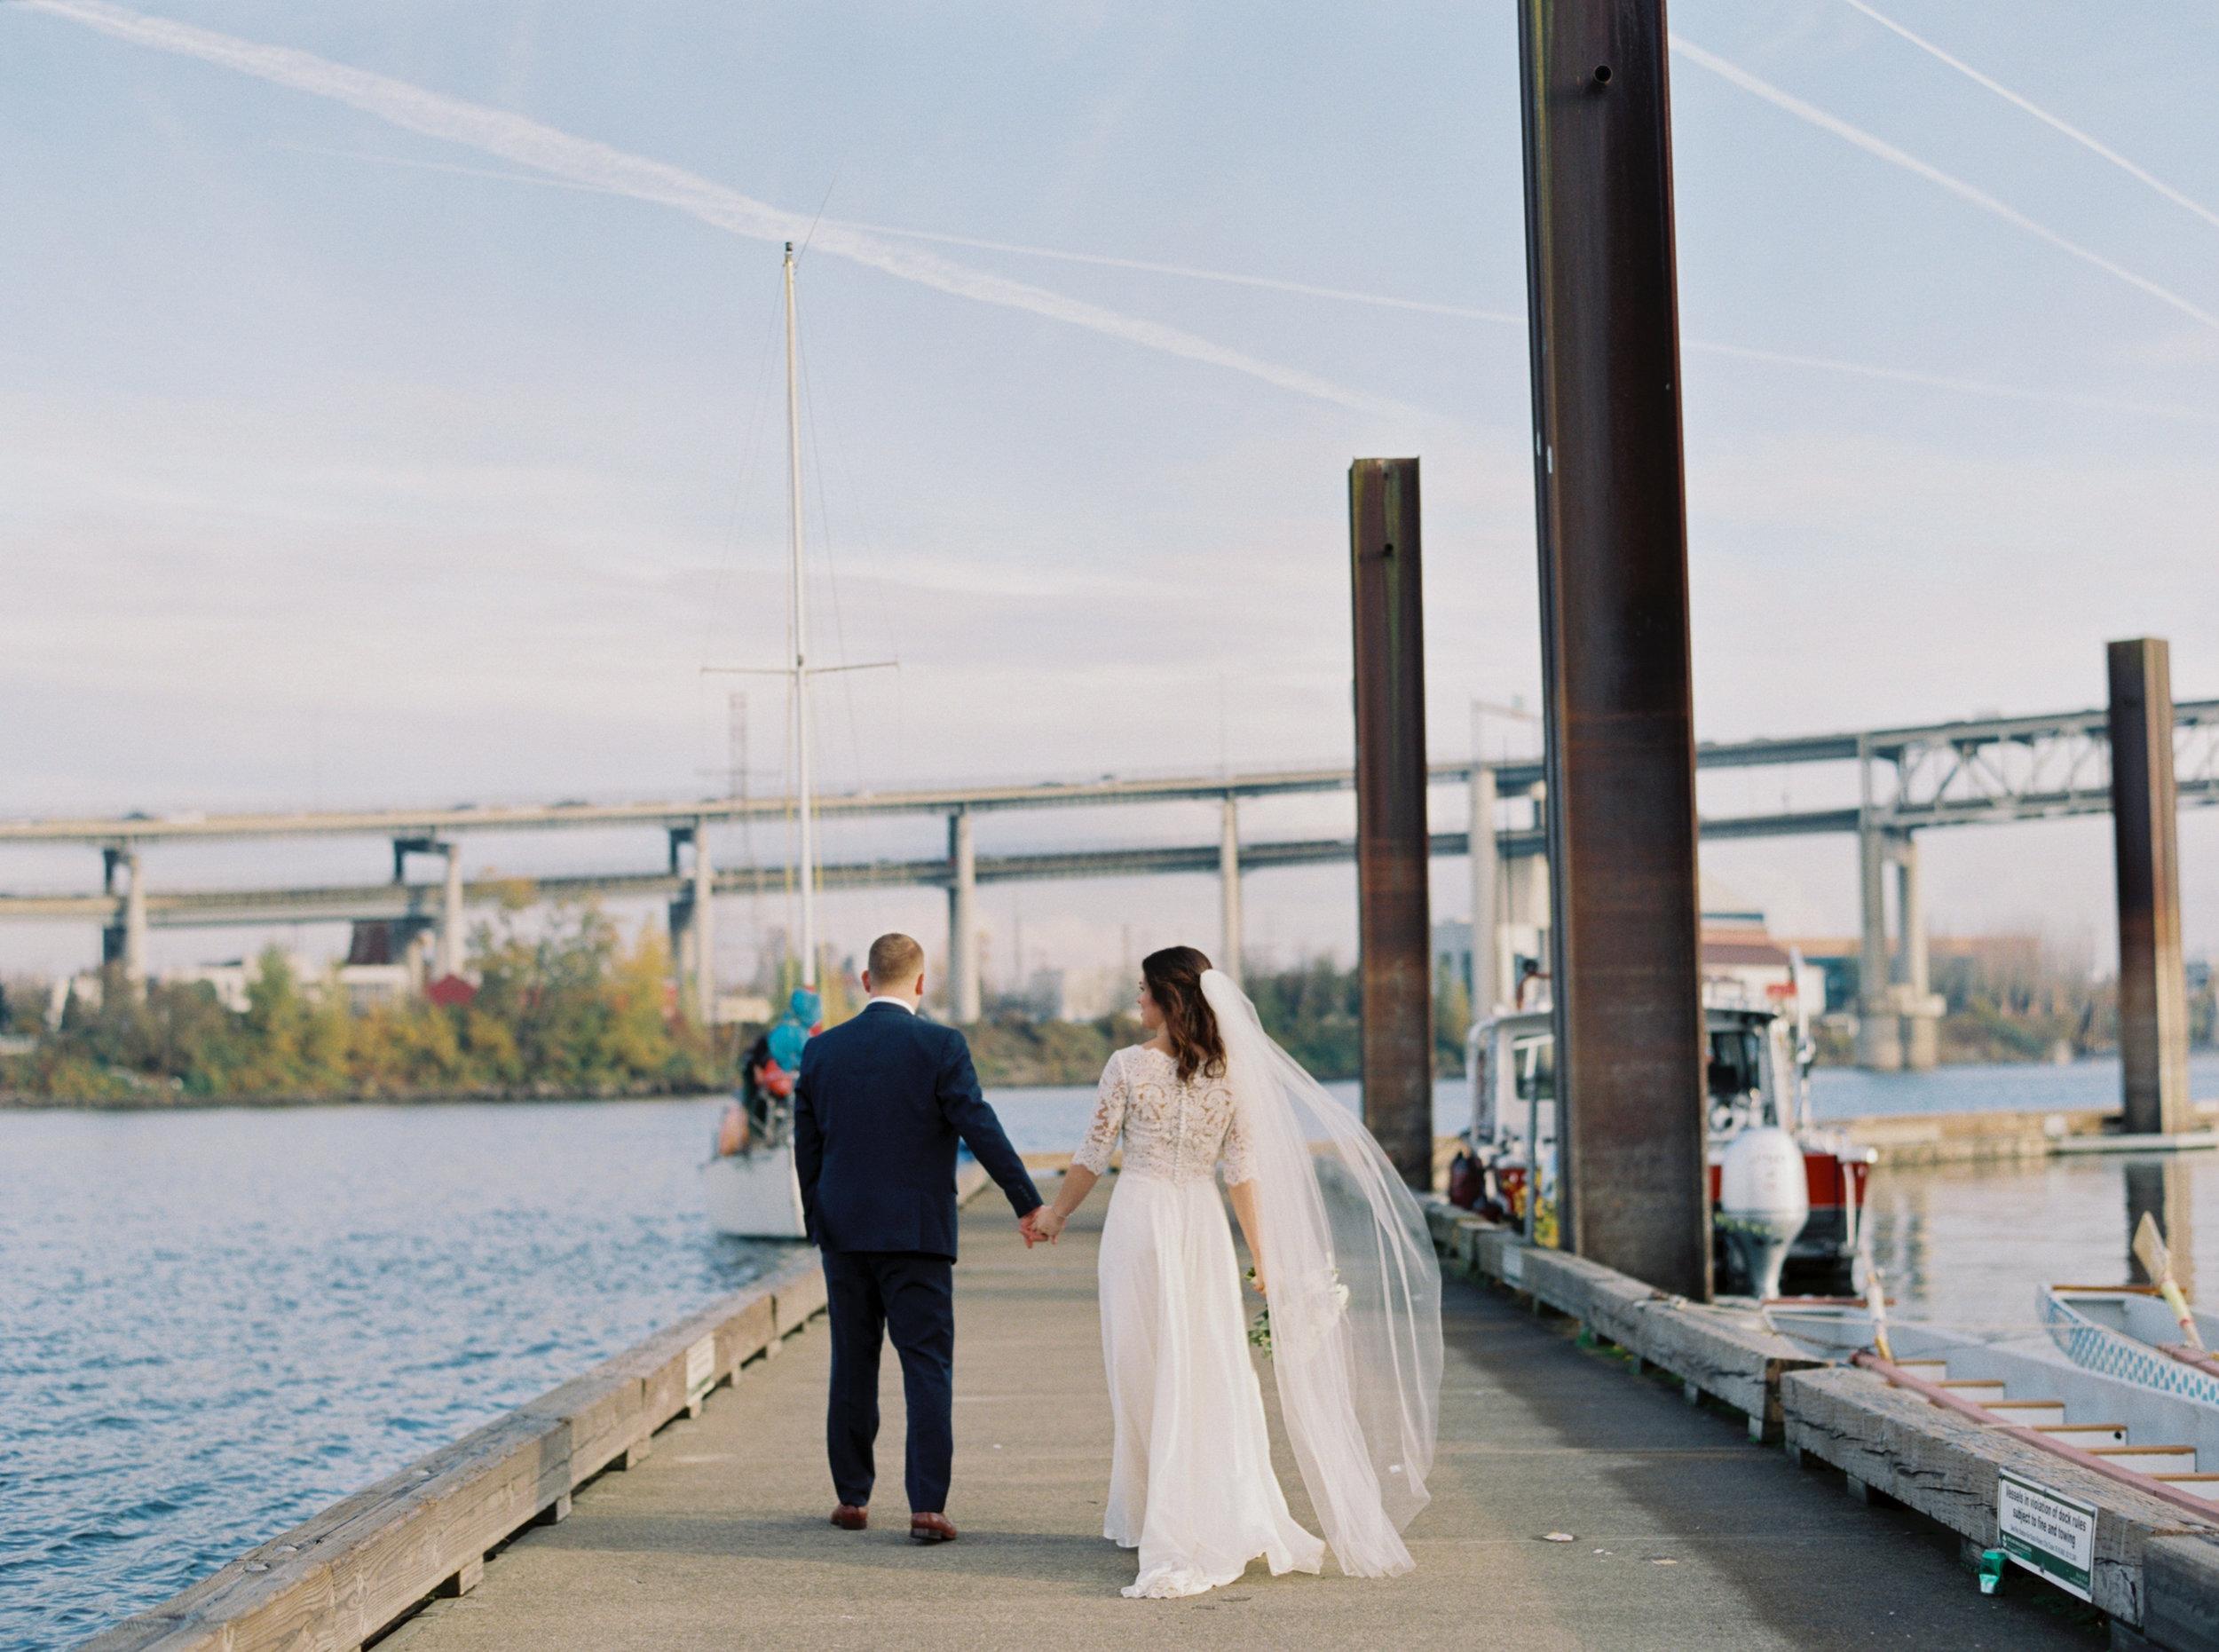 Castaway_Wedding_Photographer_Samantha&Garrett_169.jpg